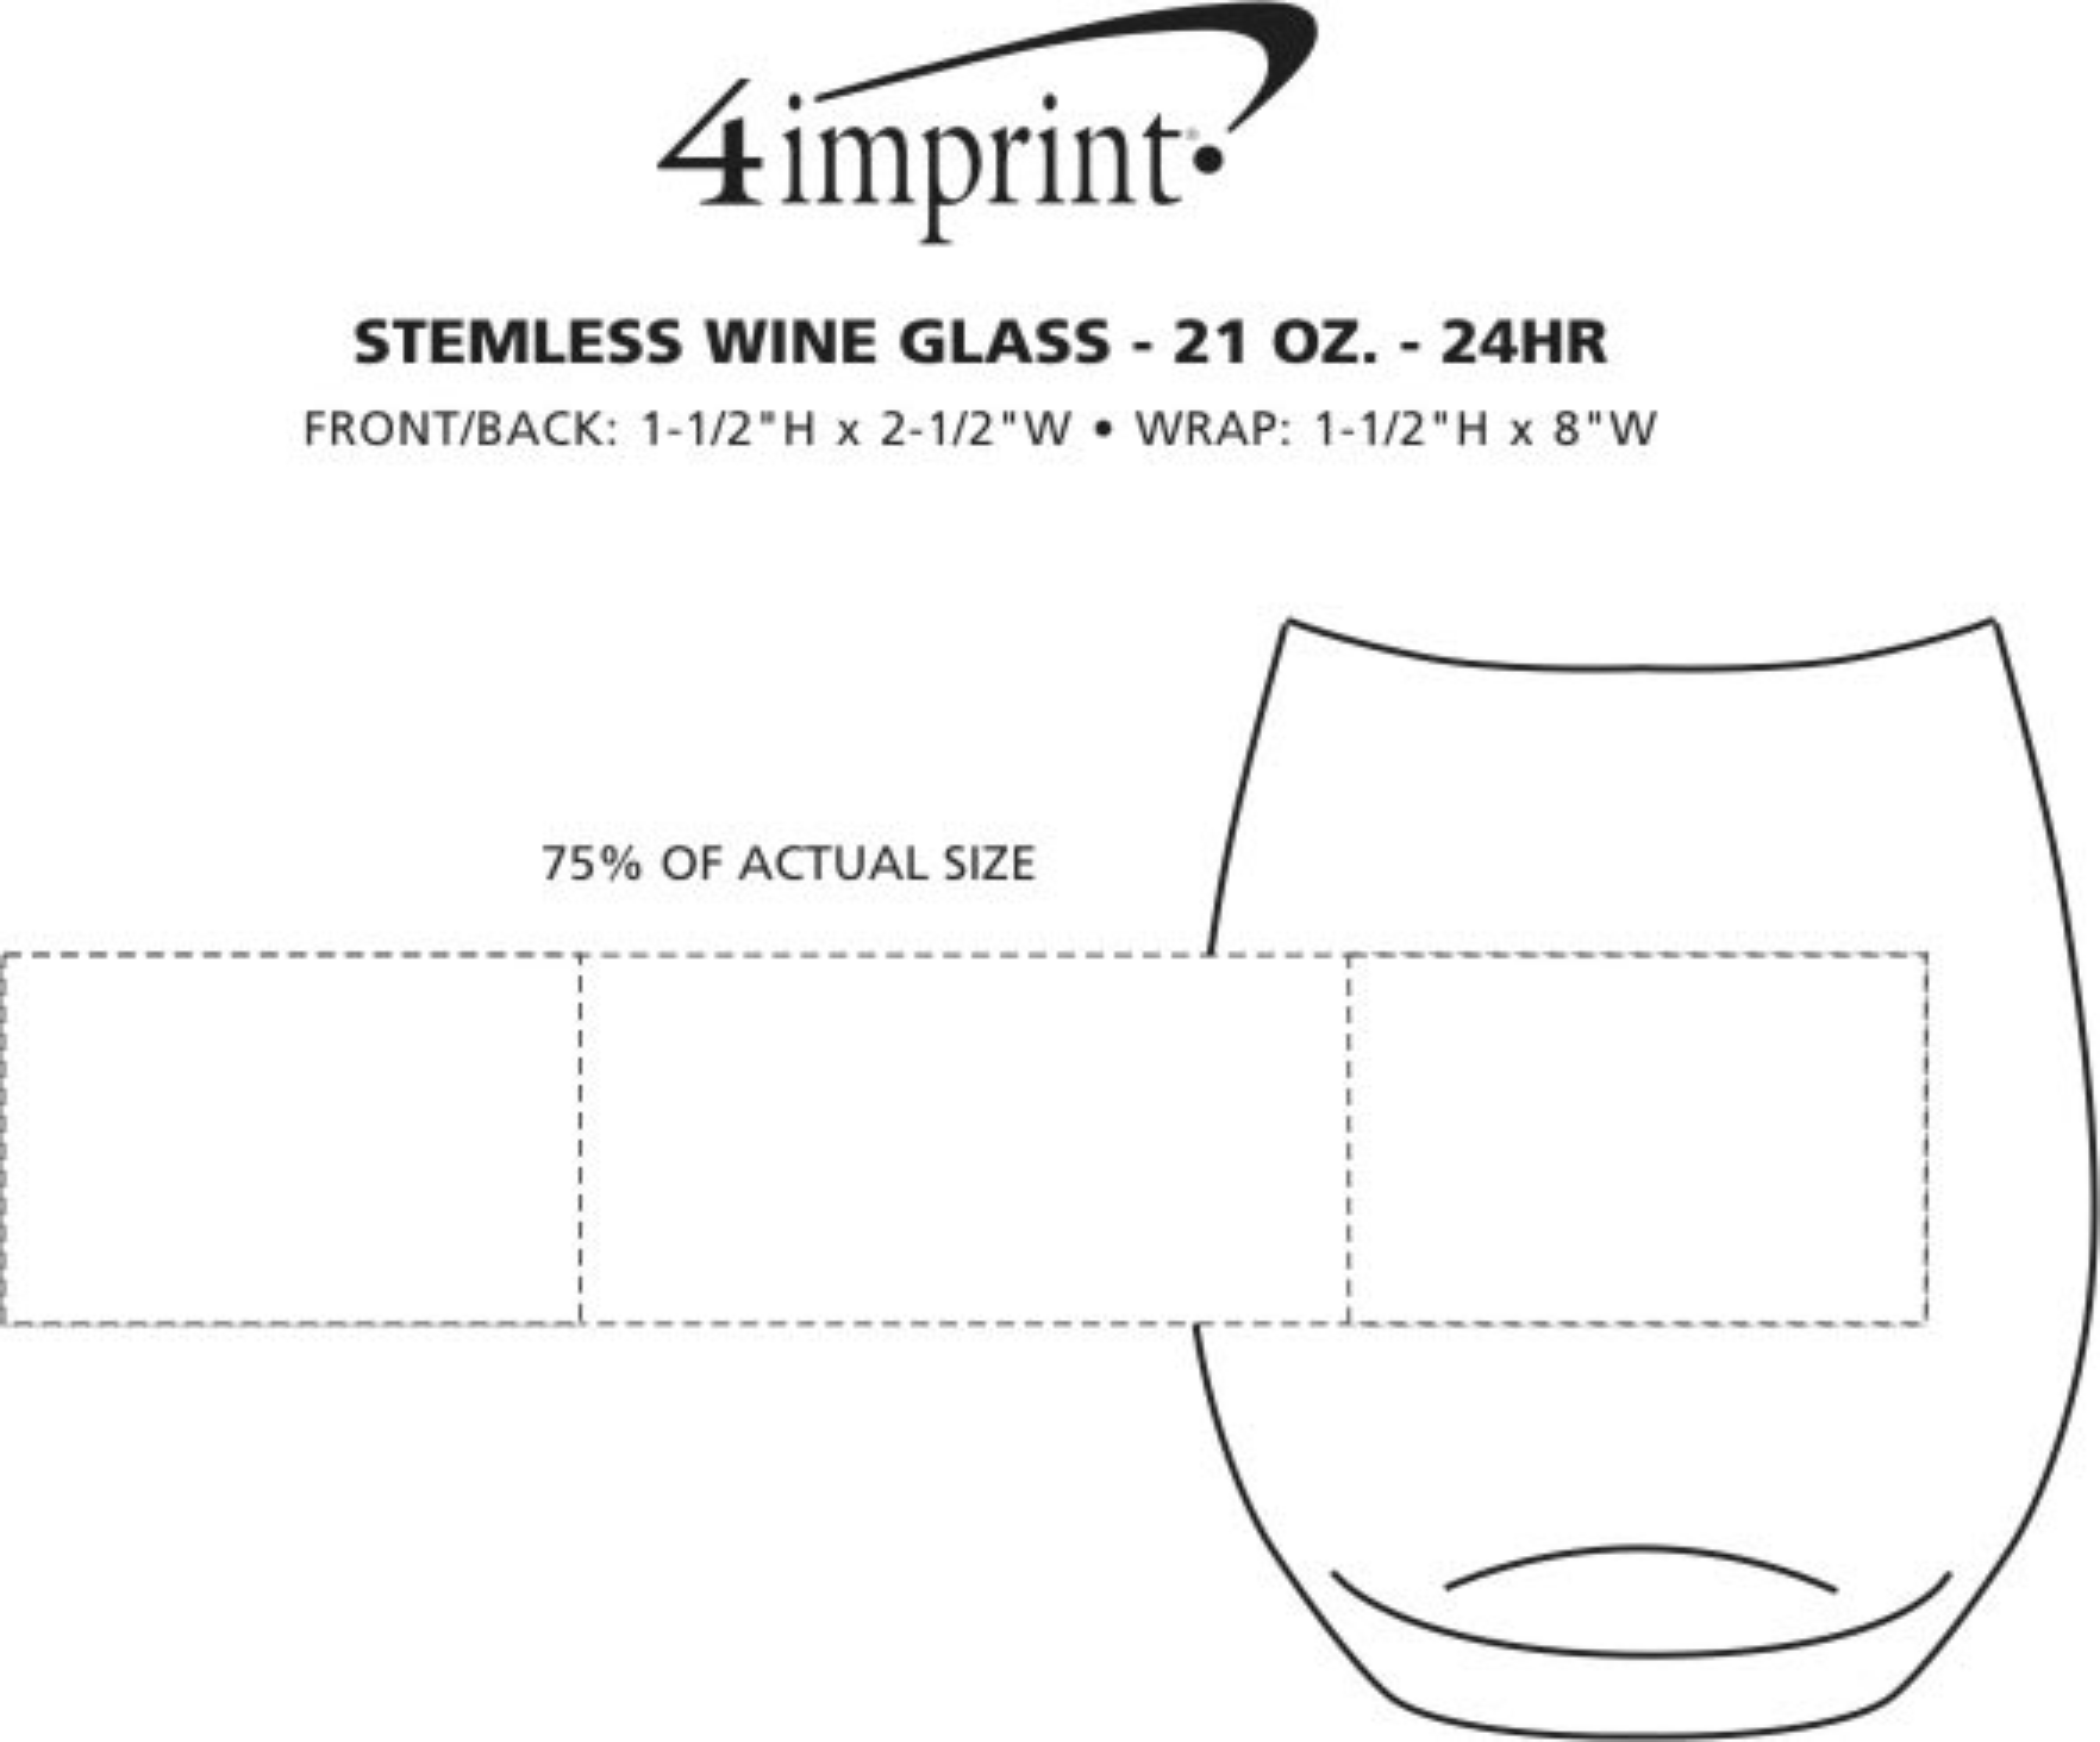 Imprint Area of Stemless Wine Glass - 21 oz. - 24 hr